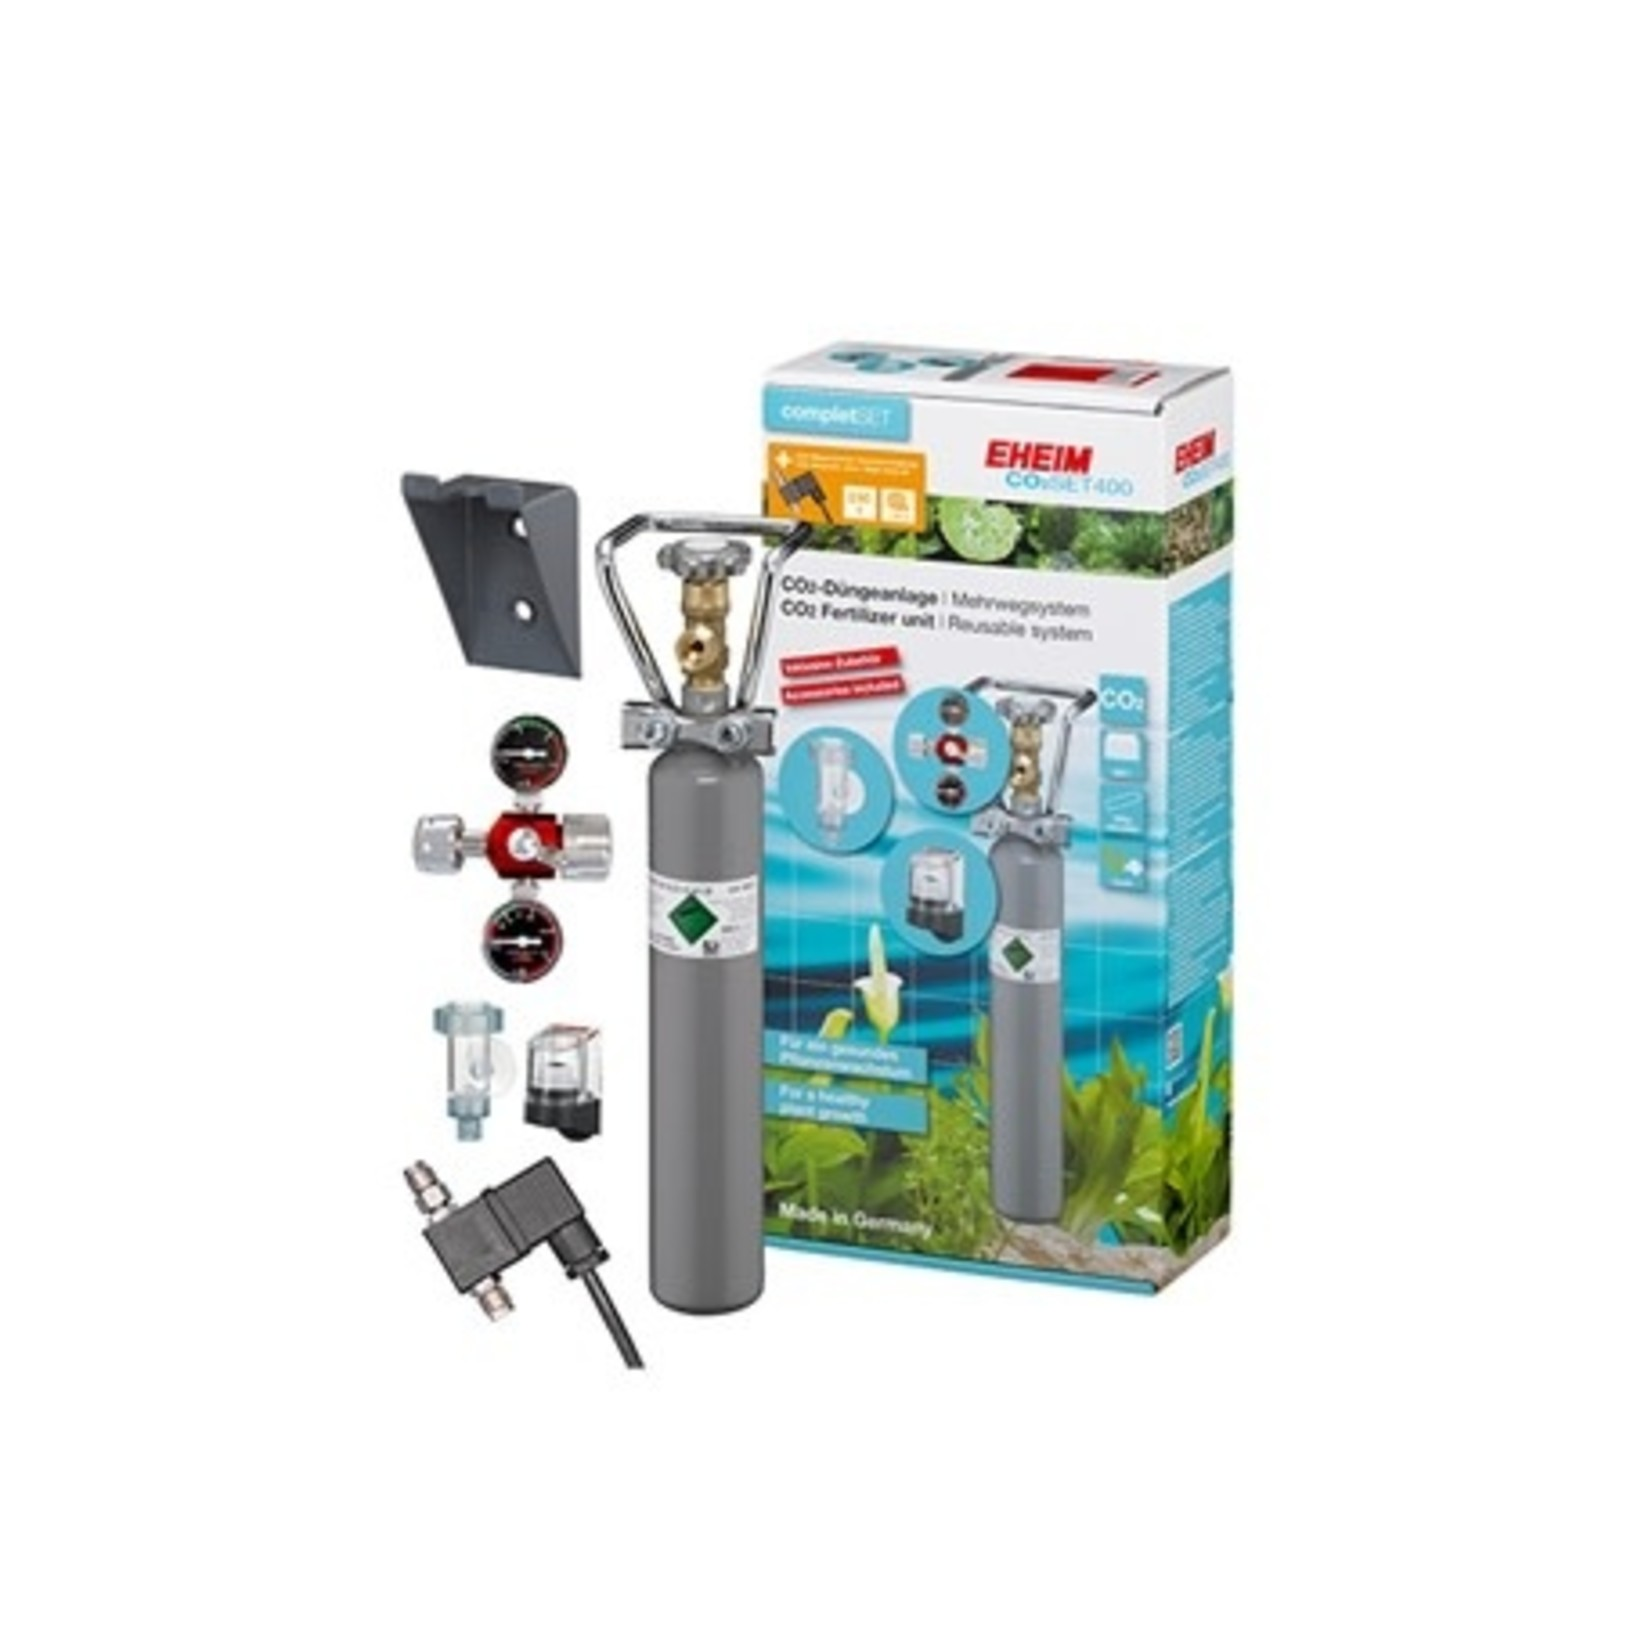 Eheim CO2 SET 400 With solenoid valve